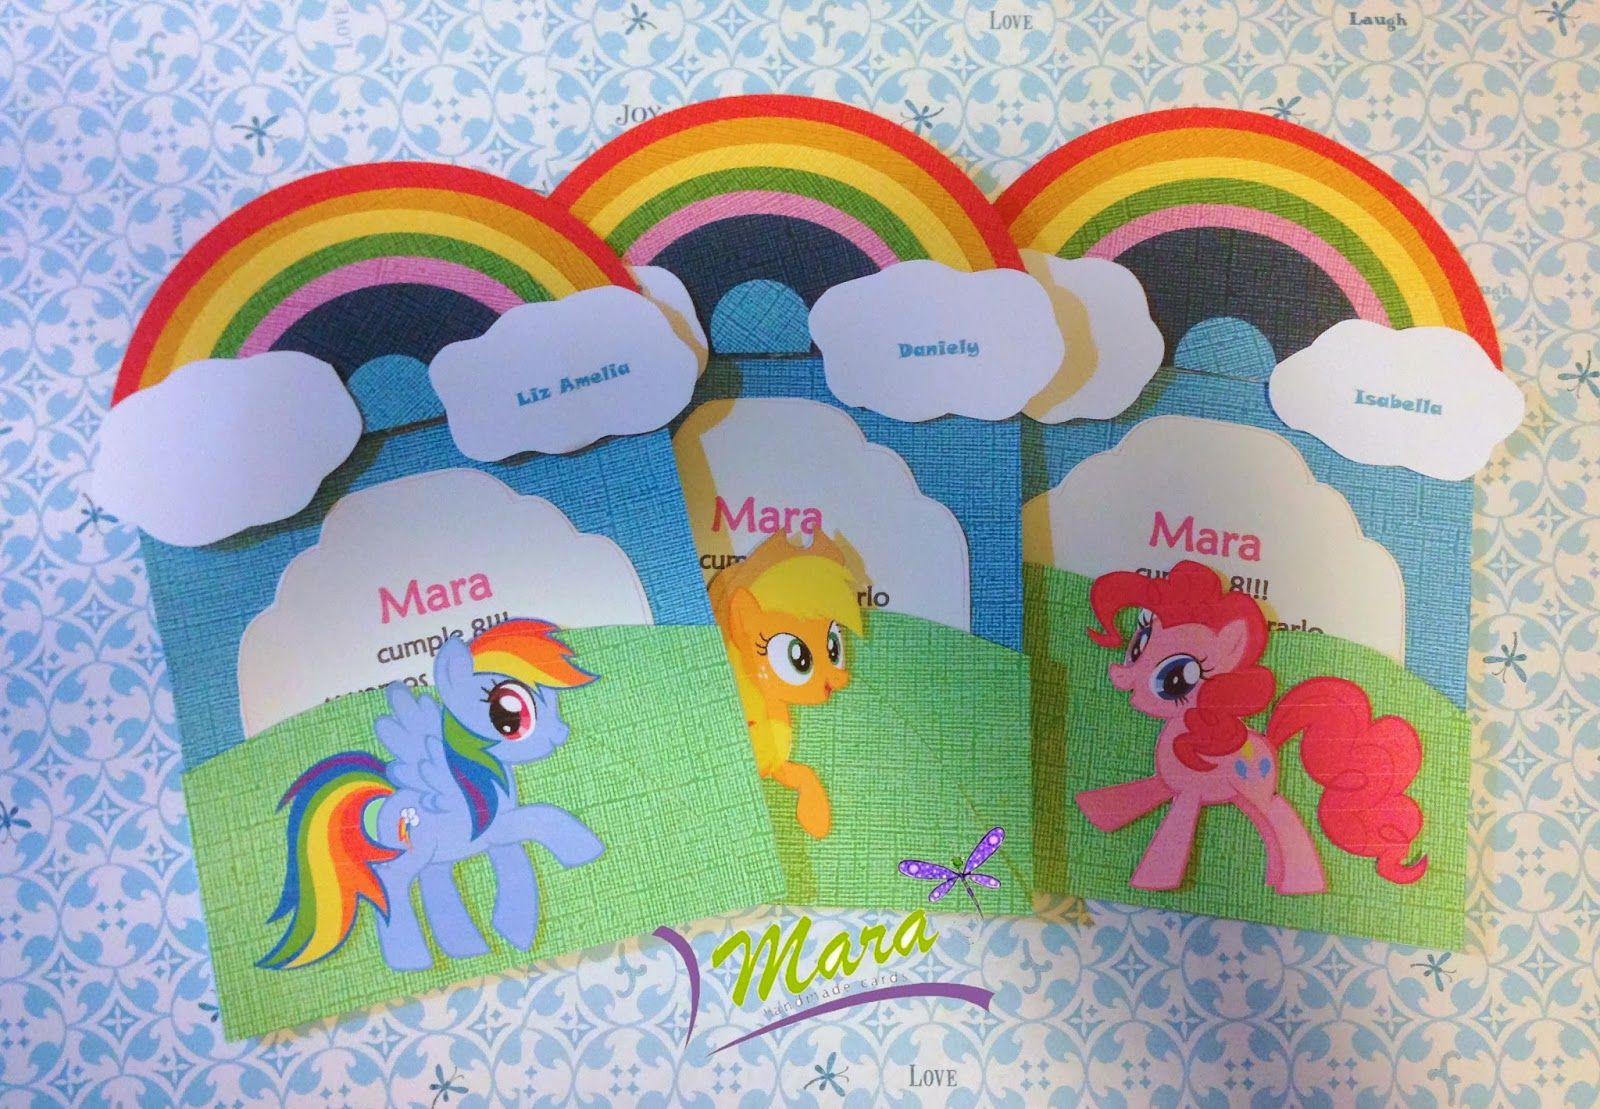 Mara Handmade My Little Pony My Little Pony 4th Bday